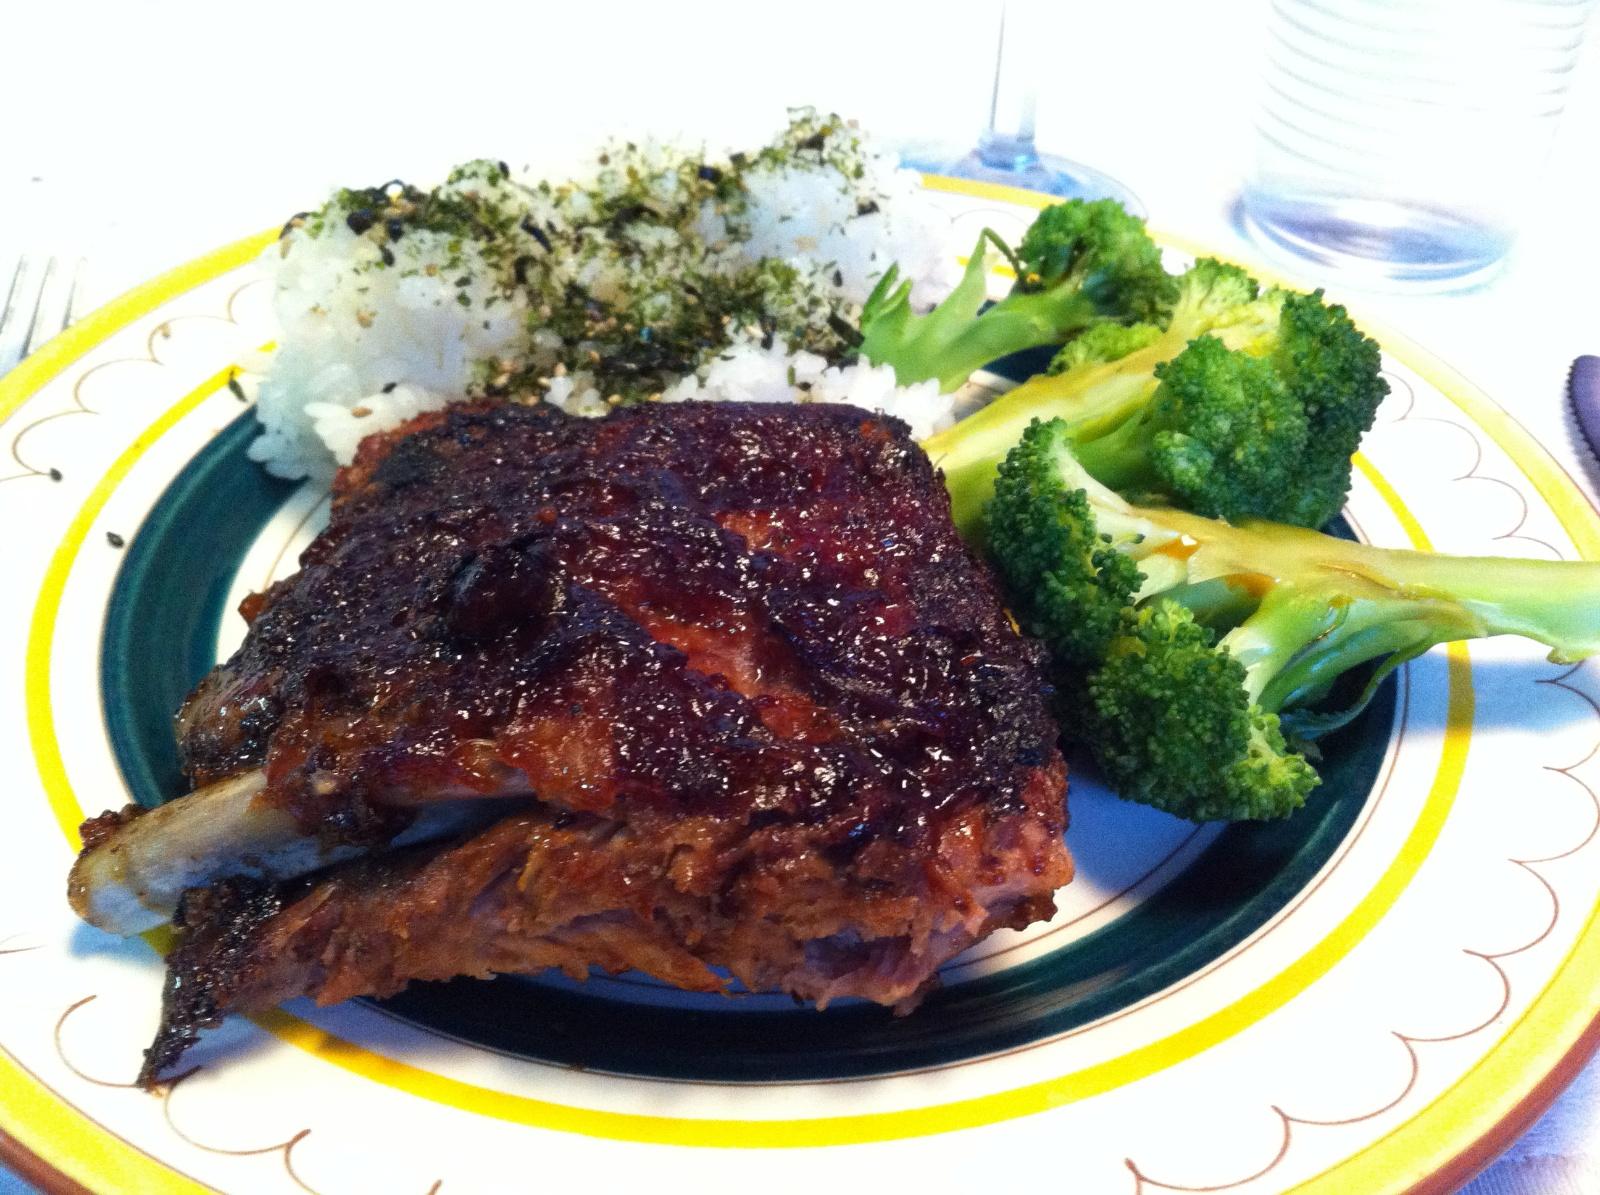 http://blog.rickk.com/food/2011/04/25/ate.2011.04.22.d.jpg